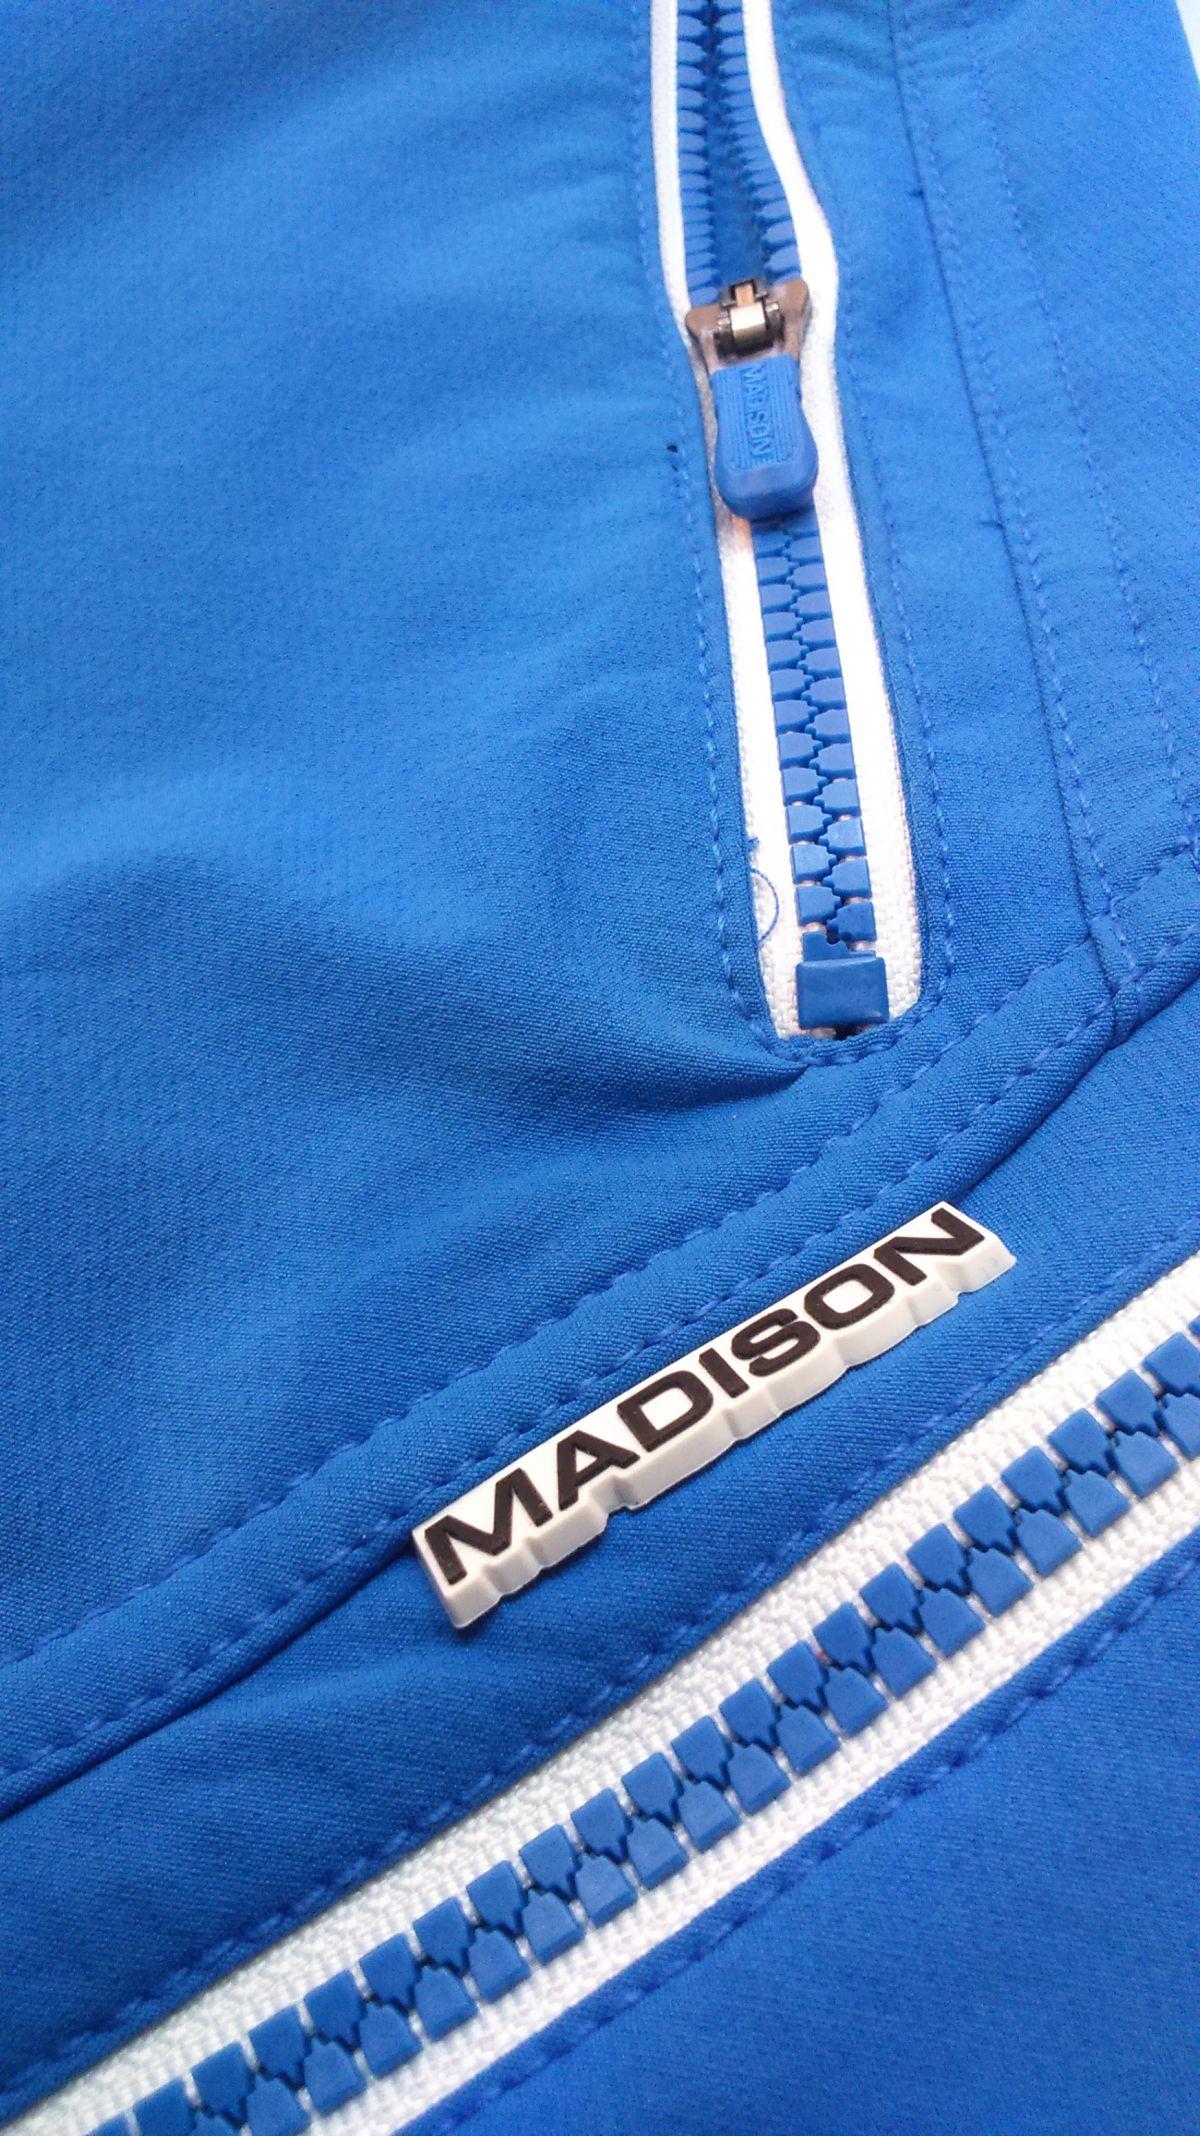 d5fd44d7ff šortky pánské Madison Zenith atlantic blue